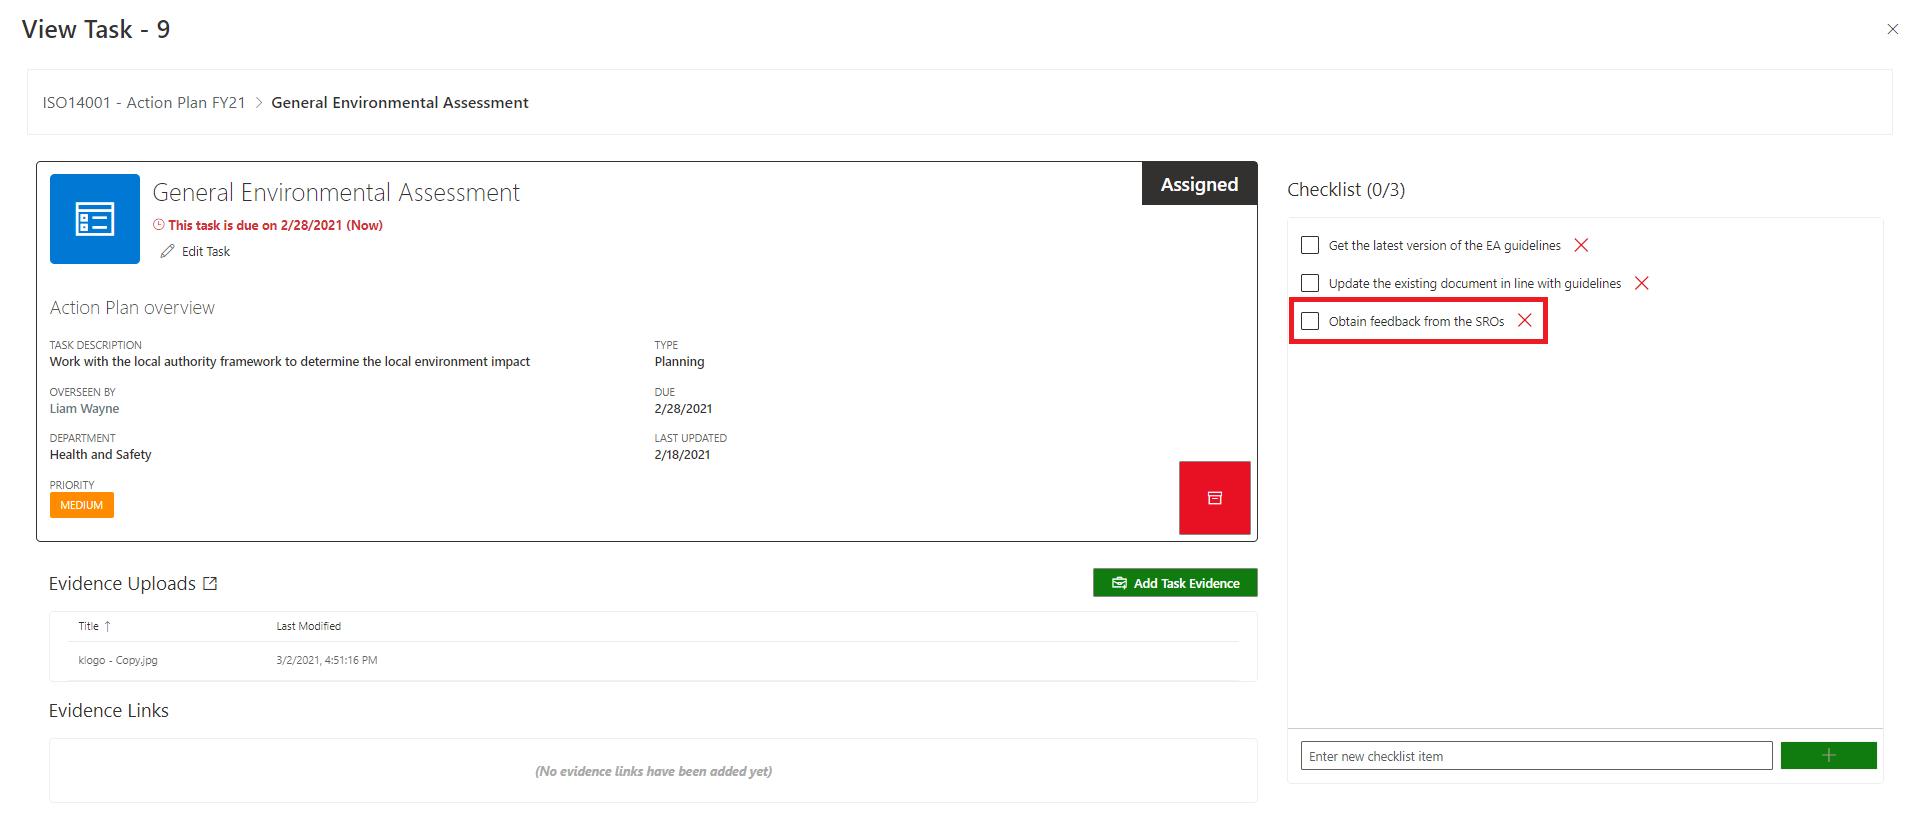 Create Checklist item 2